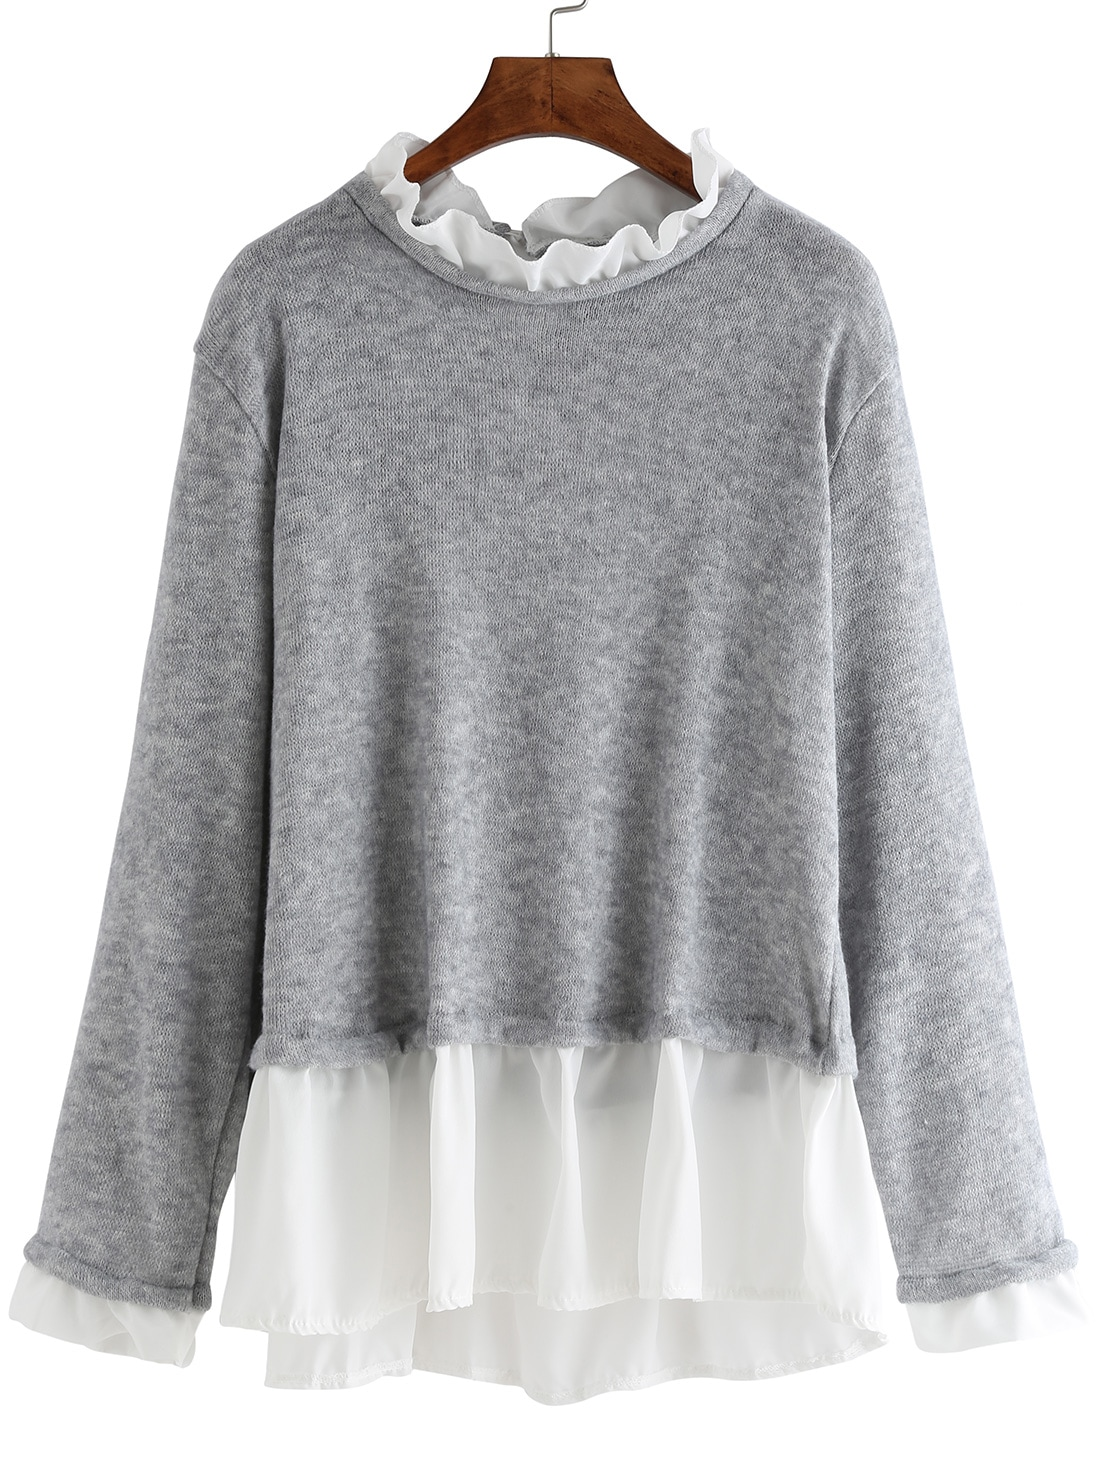 3 4 Sleeve Shirts Women